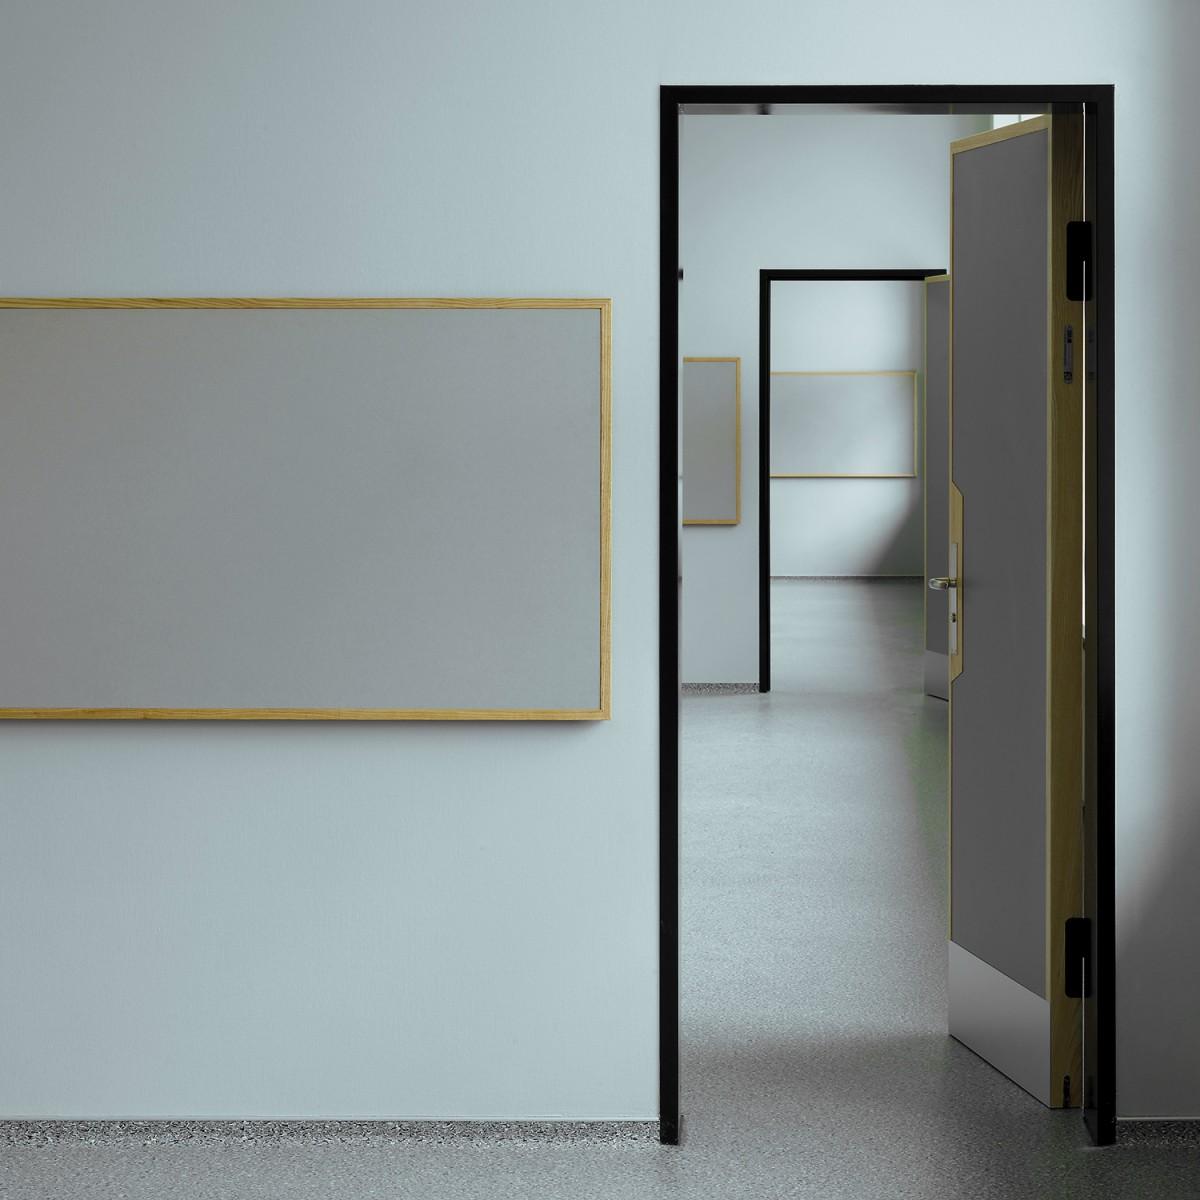 willkommen feuerschutz team. Black Bedroom Furniture Sets. Home Design Ideas